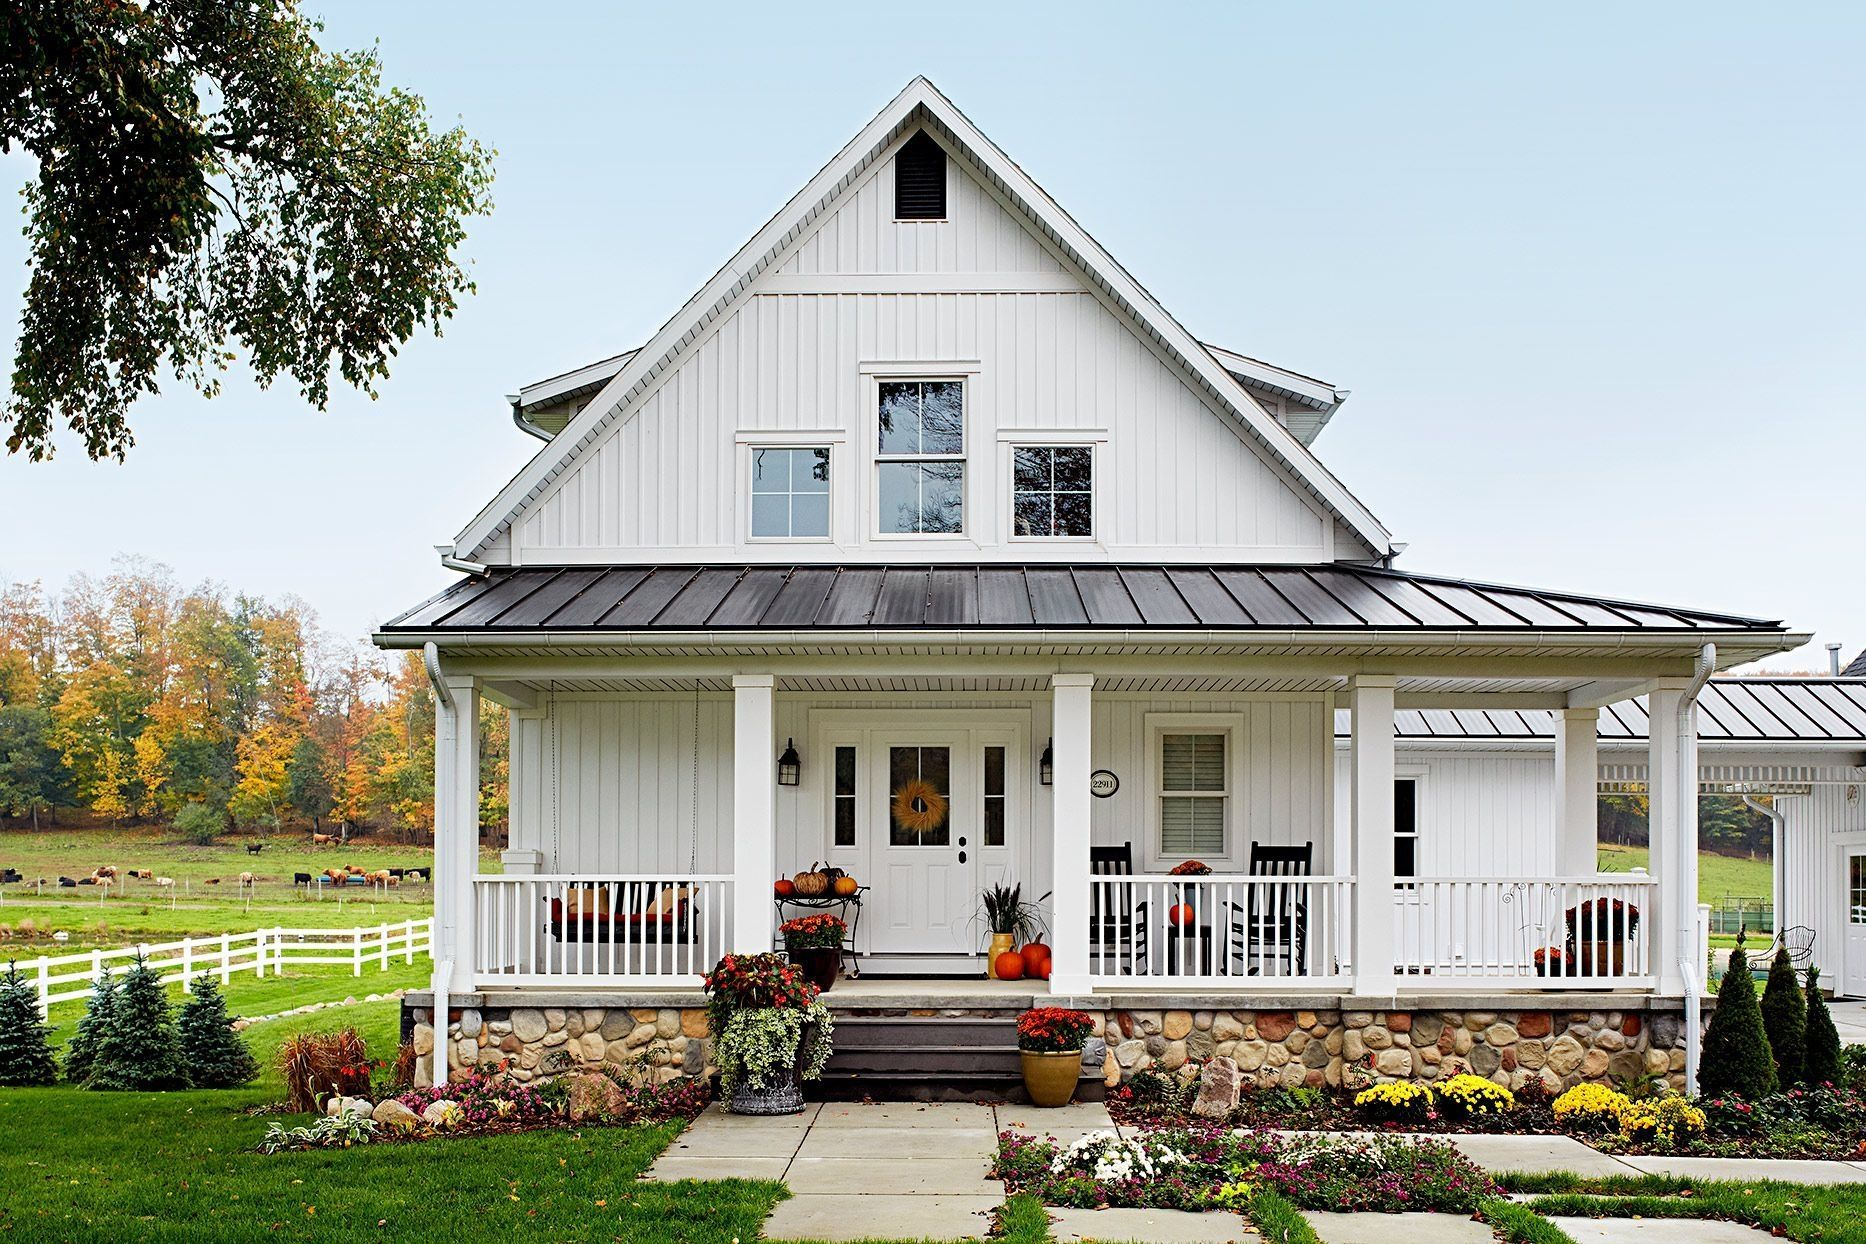 35 Modern Farmhouse Exterior Ideas In 2020 Modern Farmhouse Exterior Farmhouse Style House Farmhouse Exterior